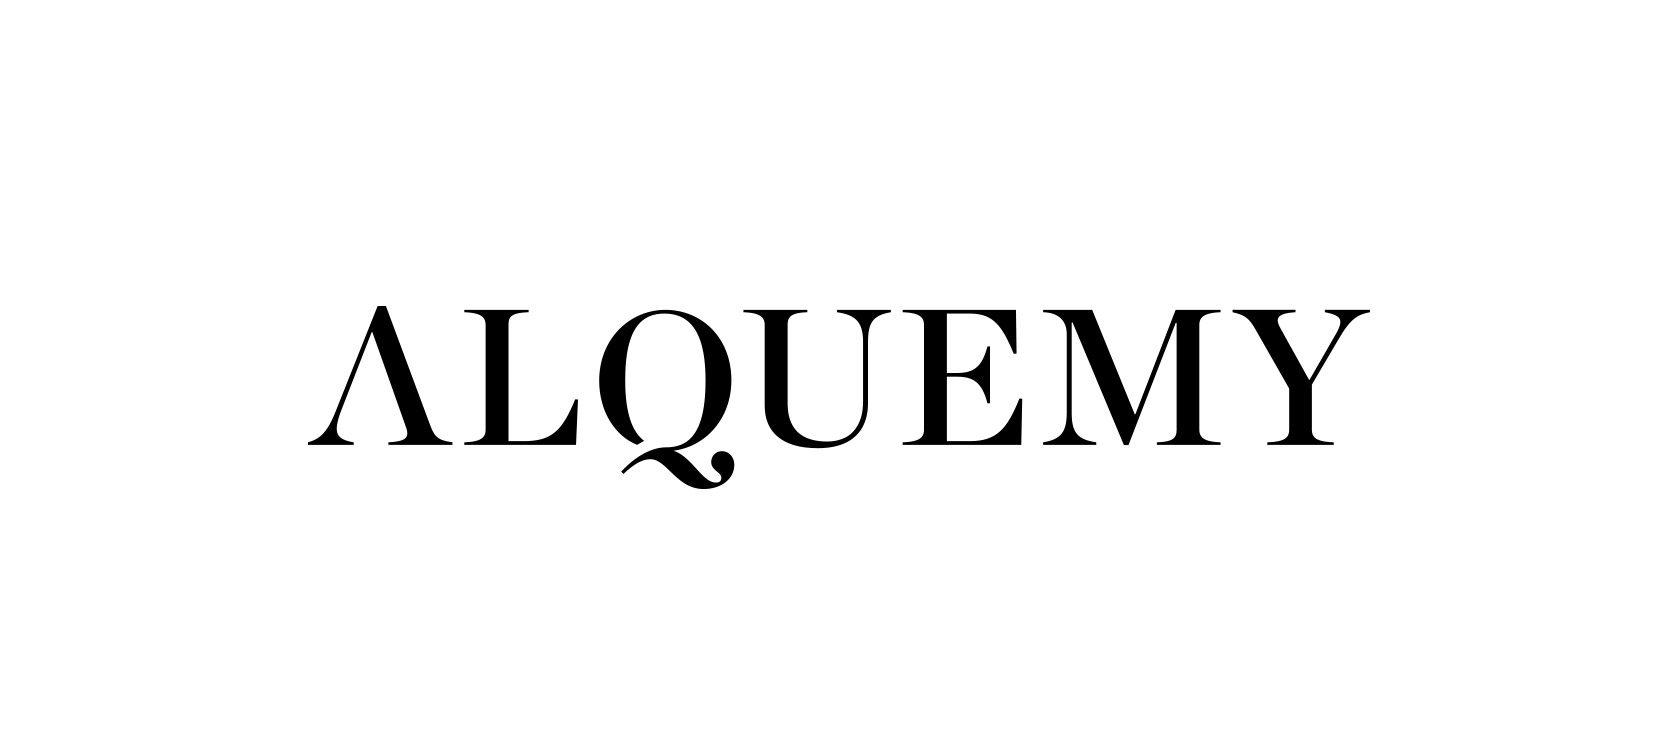 Alquemy Logo Identity Design by Furia